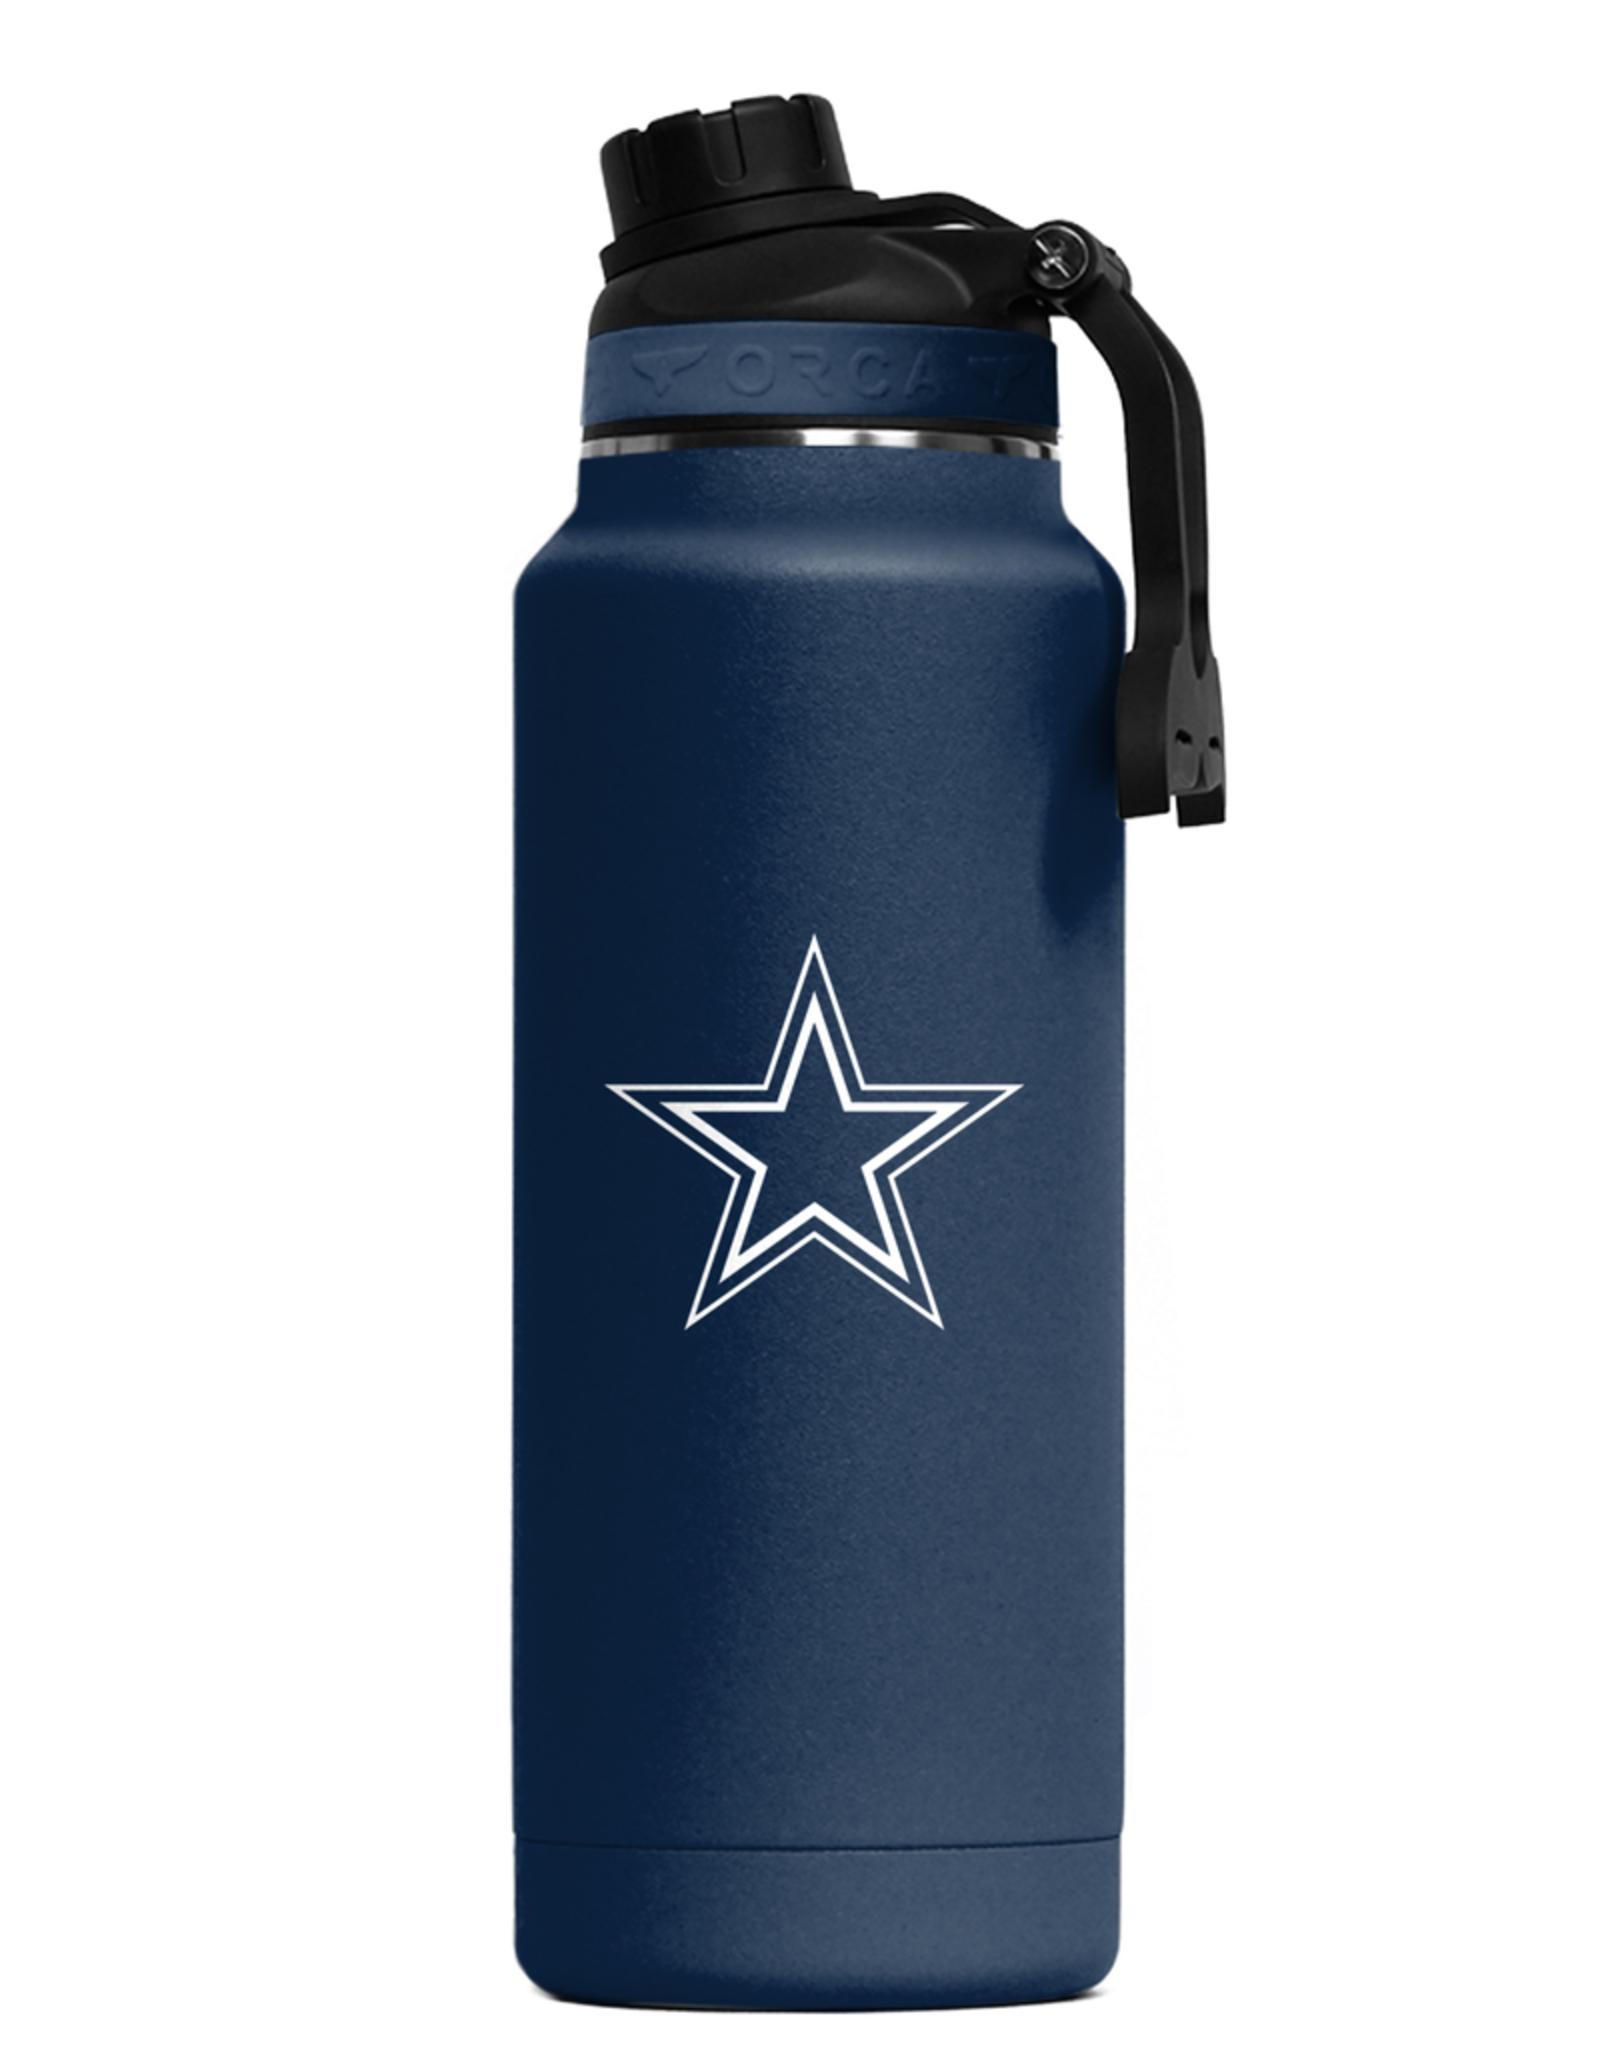 ORCA COOLERS Dallas Cowboys Orca 34oz Hydra Bottle